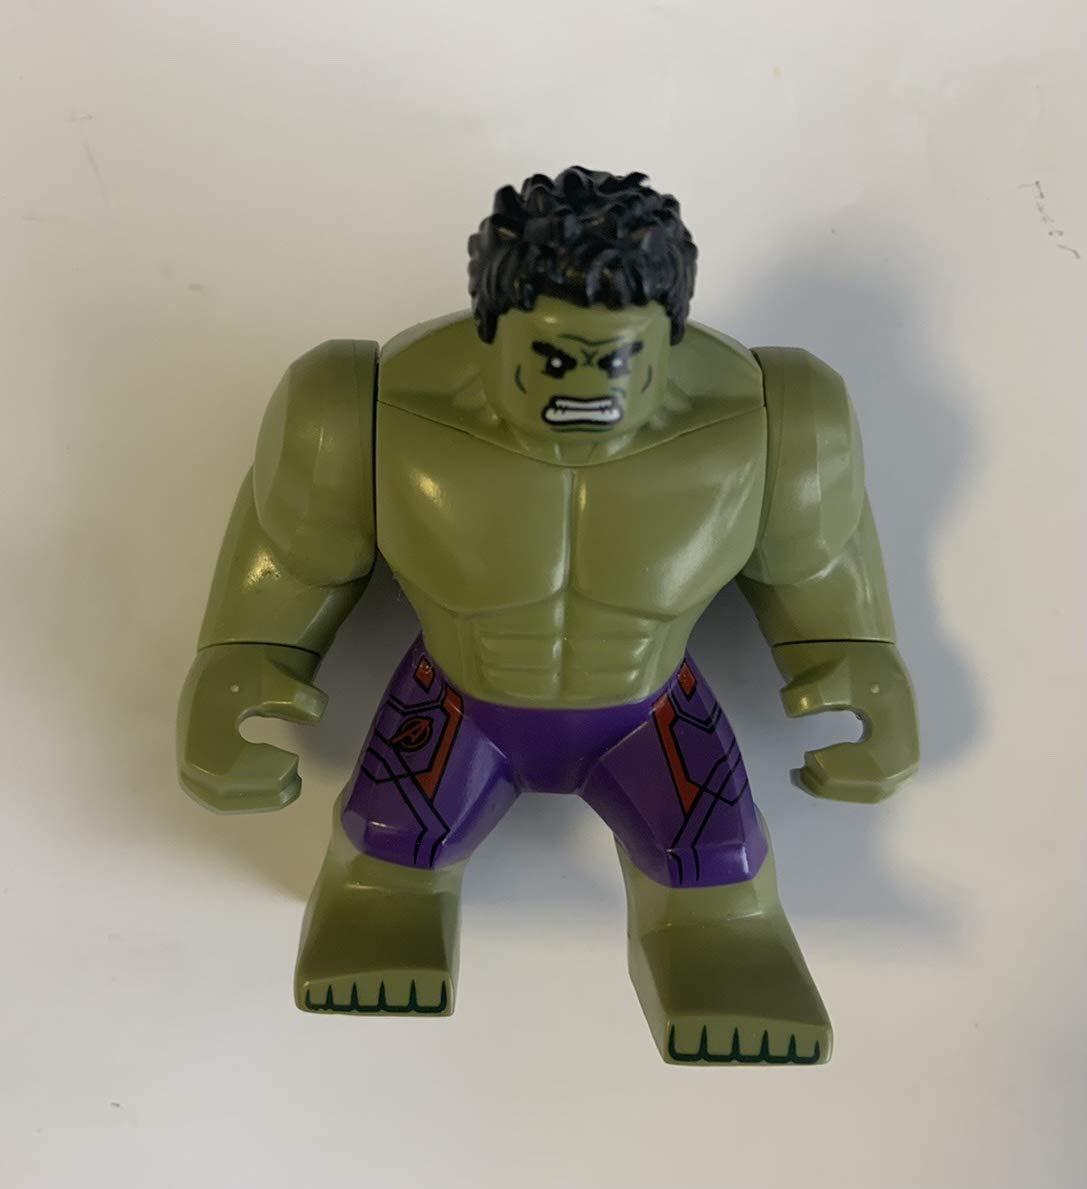 LEGO GENUINE Age of Ultron - INCREDIBLE HULK Supersize Minifigure - Split from 76031 Set